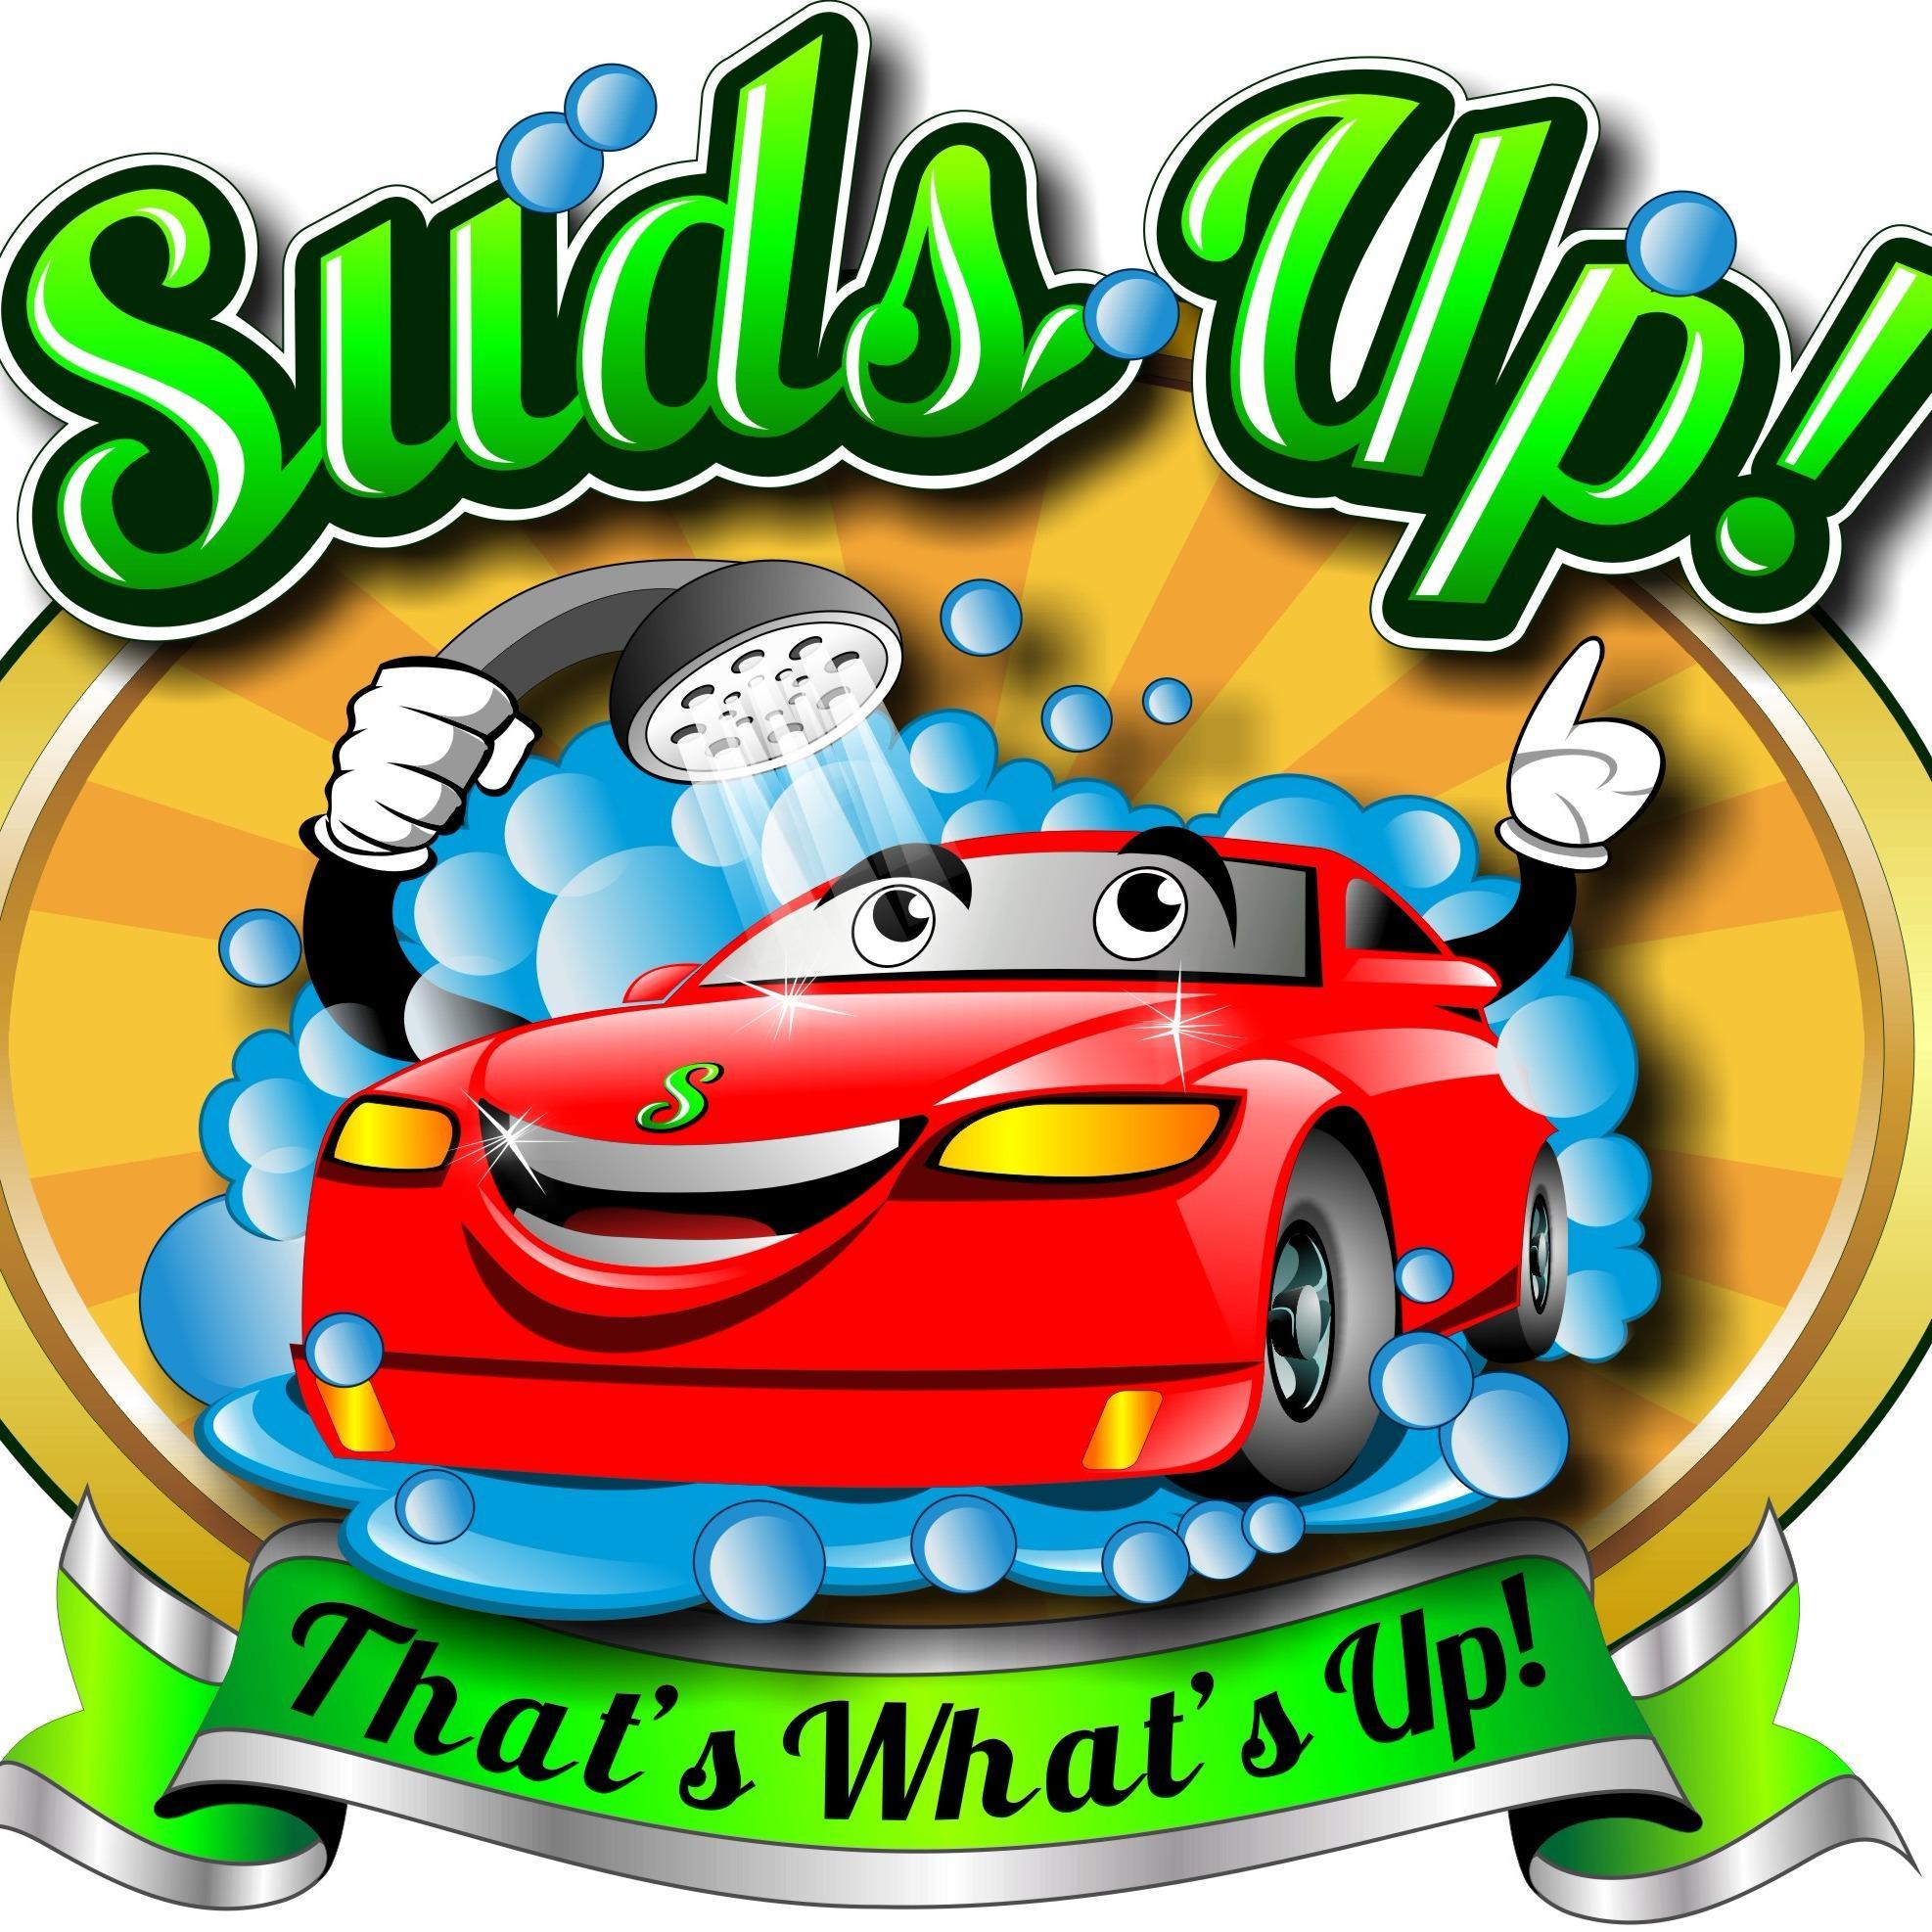 Suds Up Car Wash